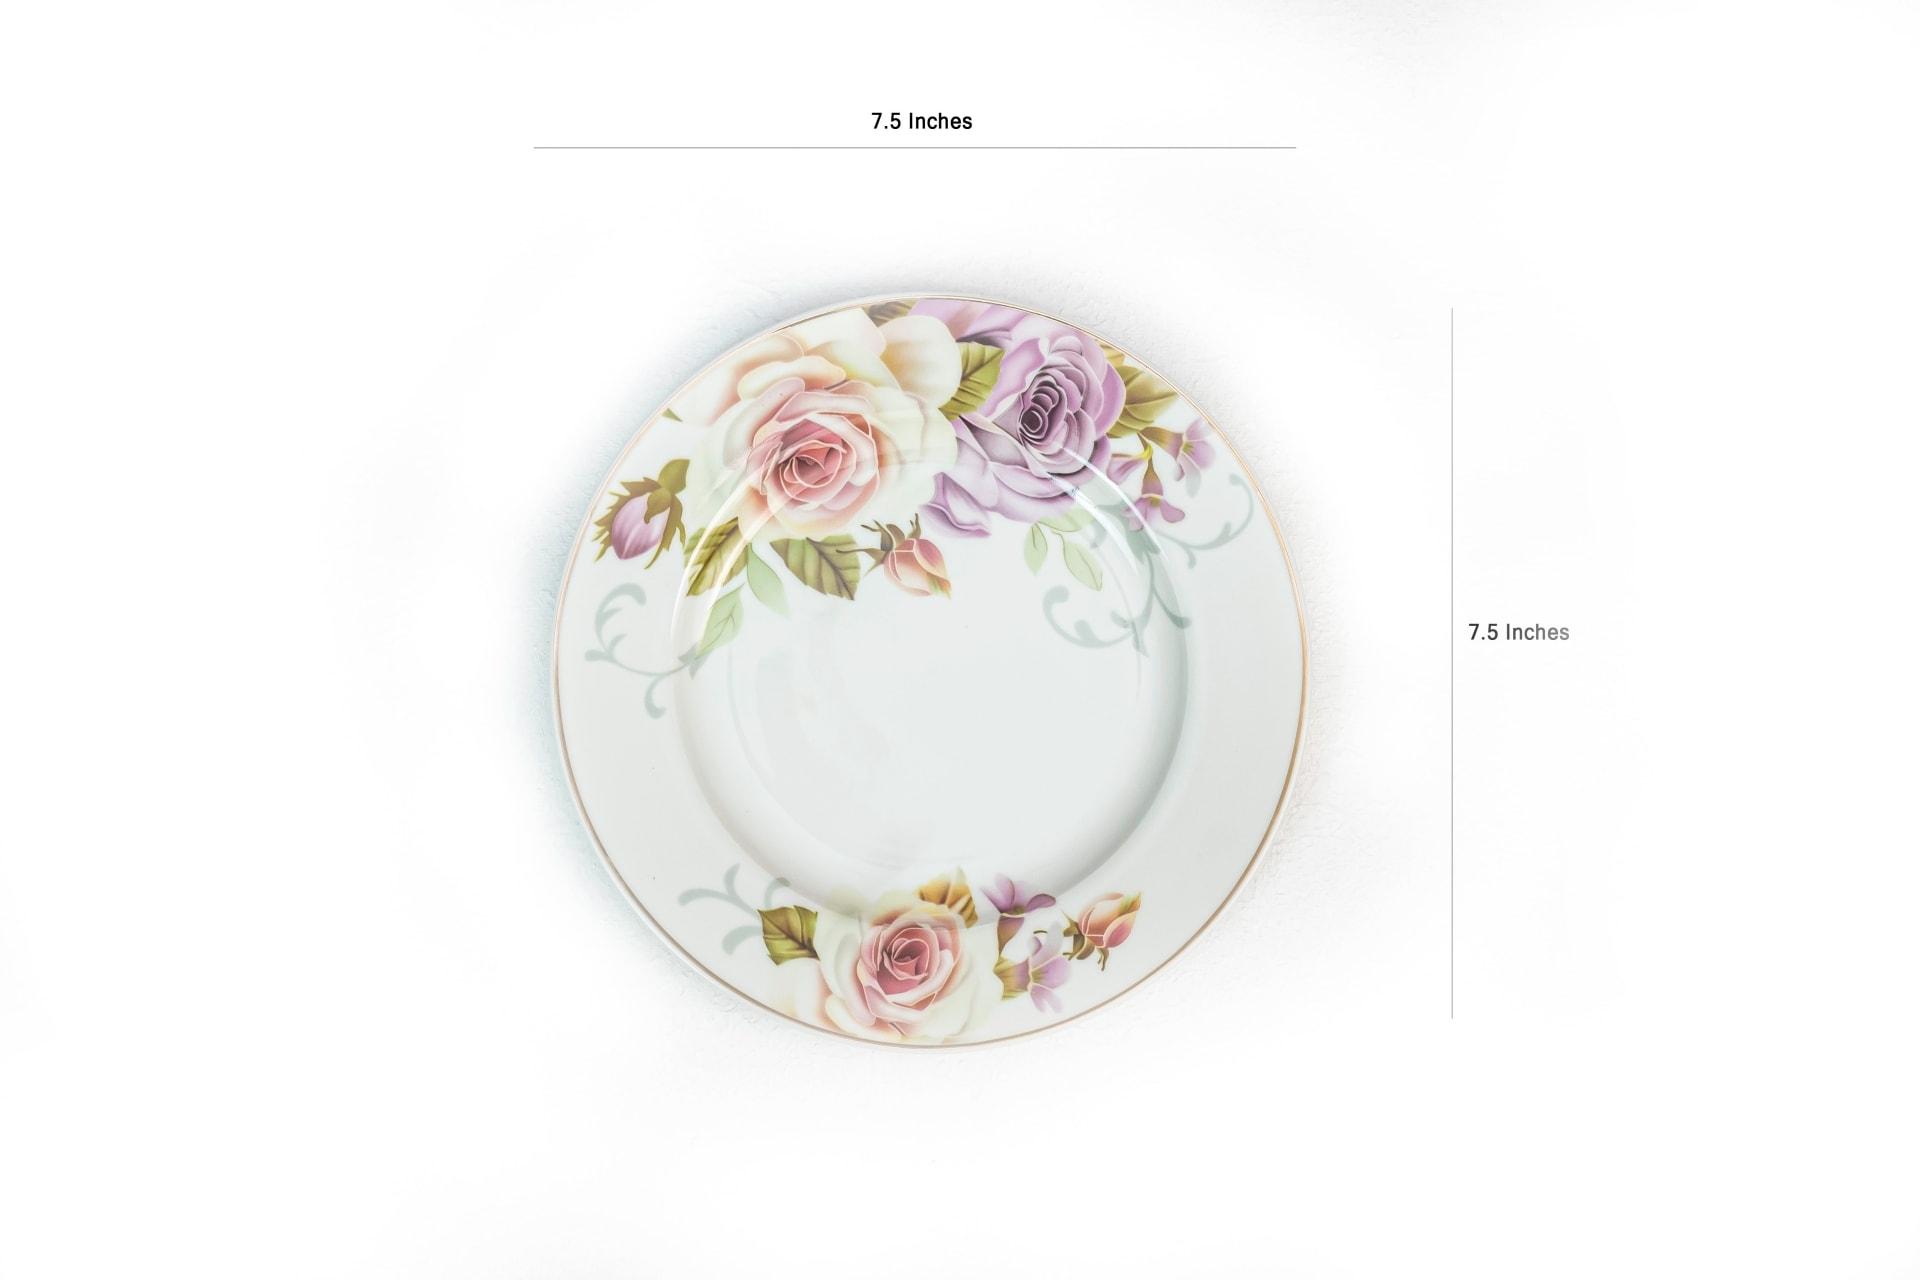 Viola Floral Ensemble Dinner Set